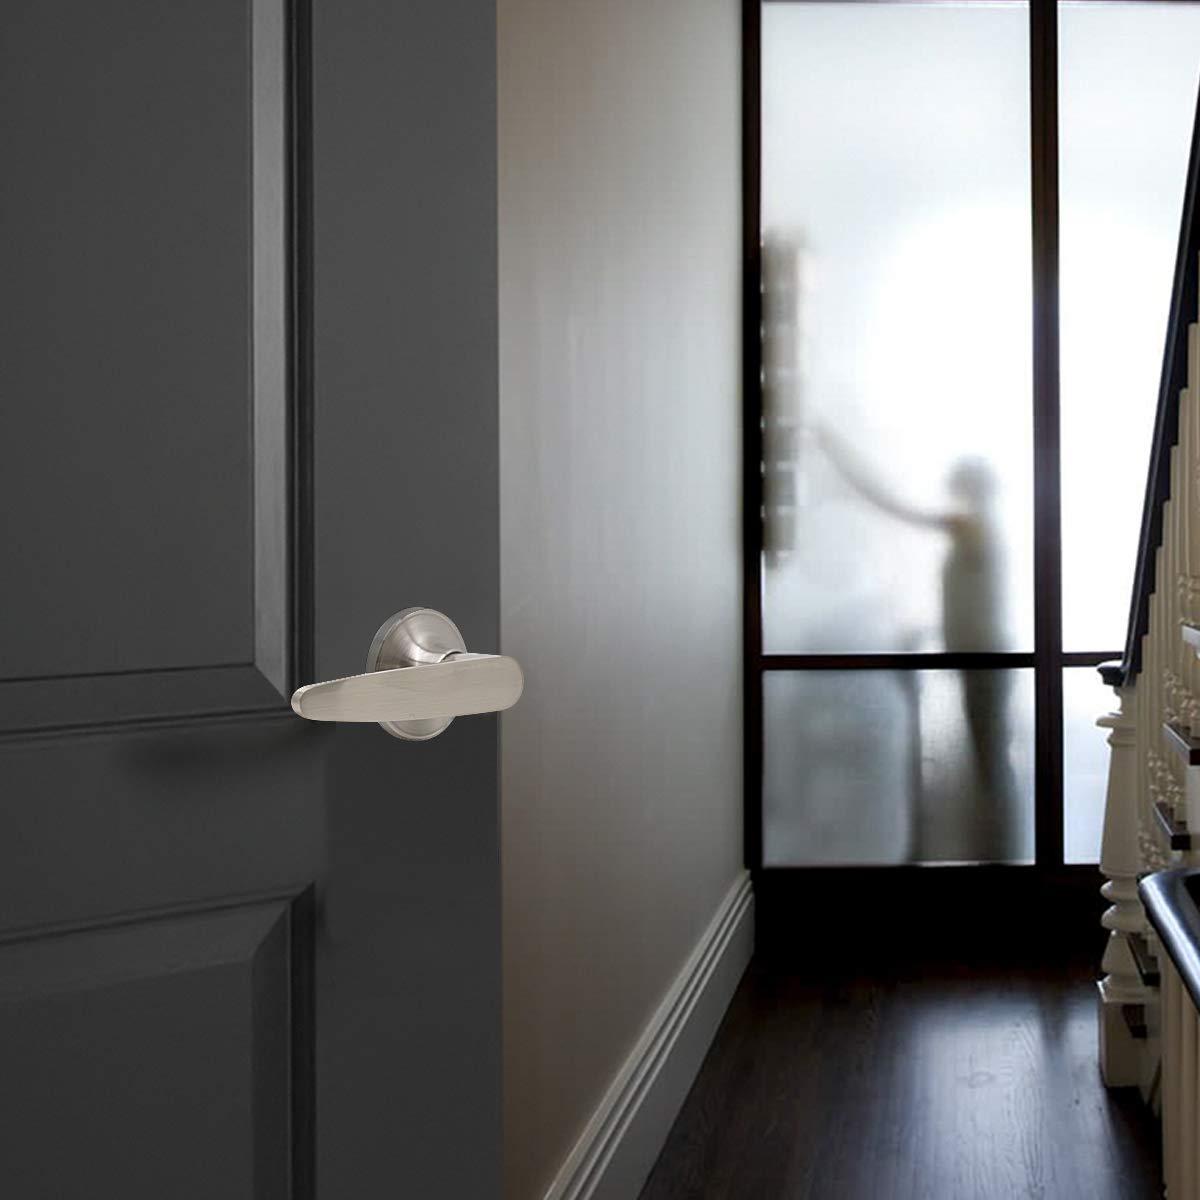 6 Pack Probrico Wave Style Lever Handle Passage Hall and Closet Leverset Lockset,Brushed Satin Nickel Finish